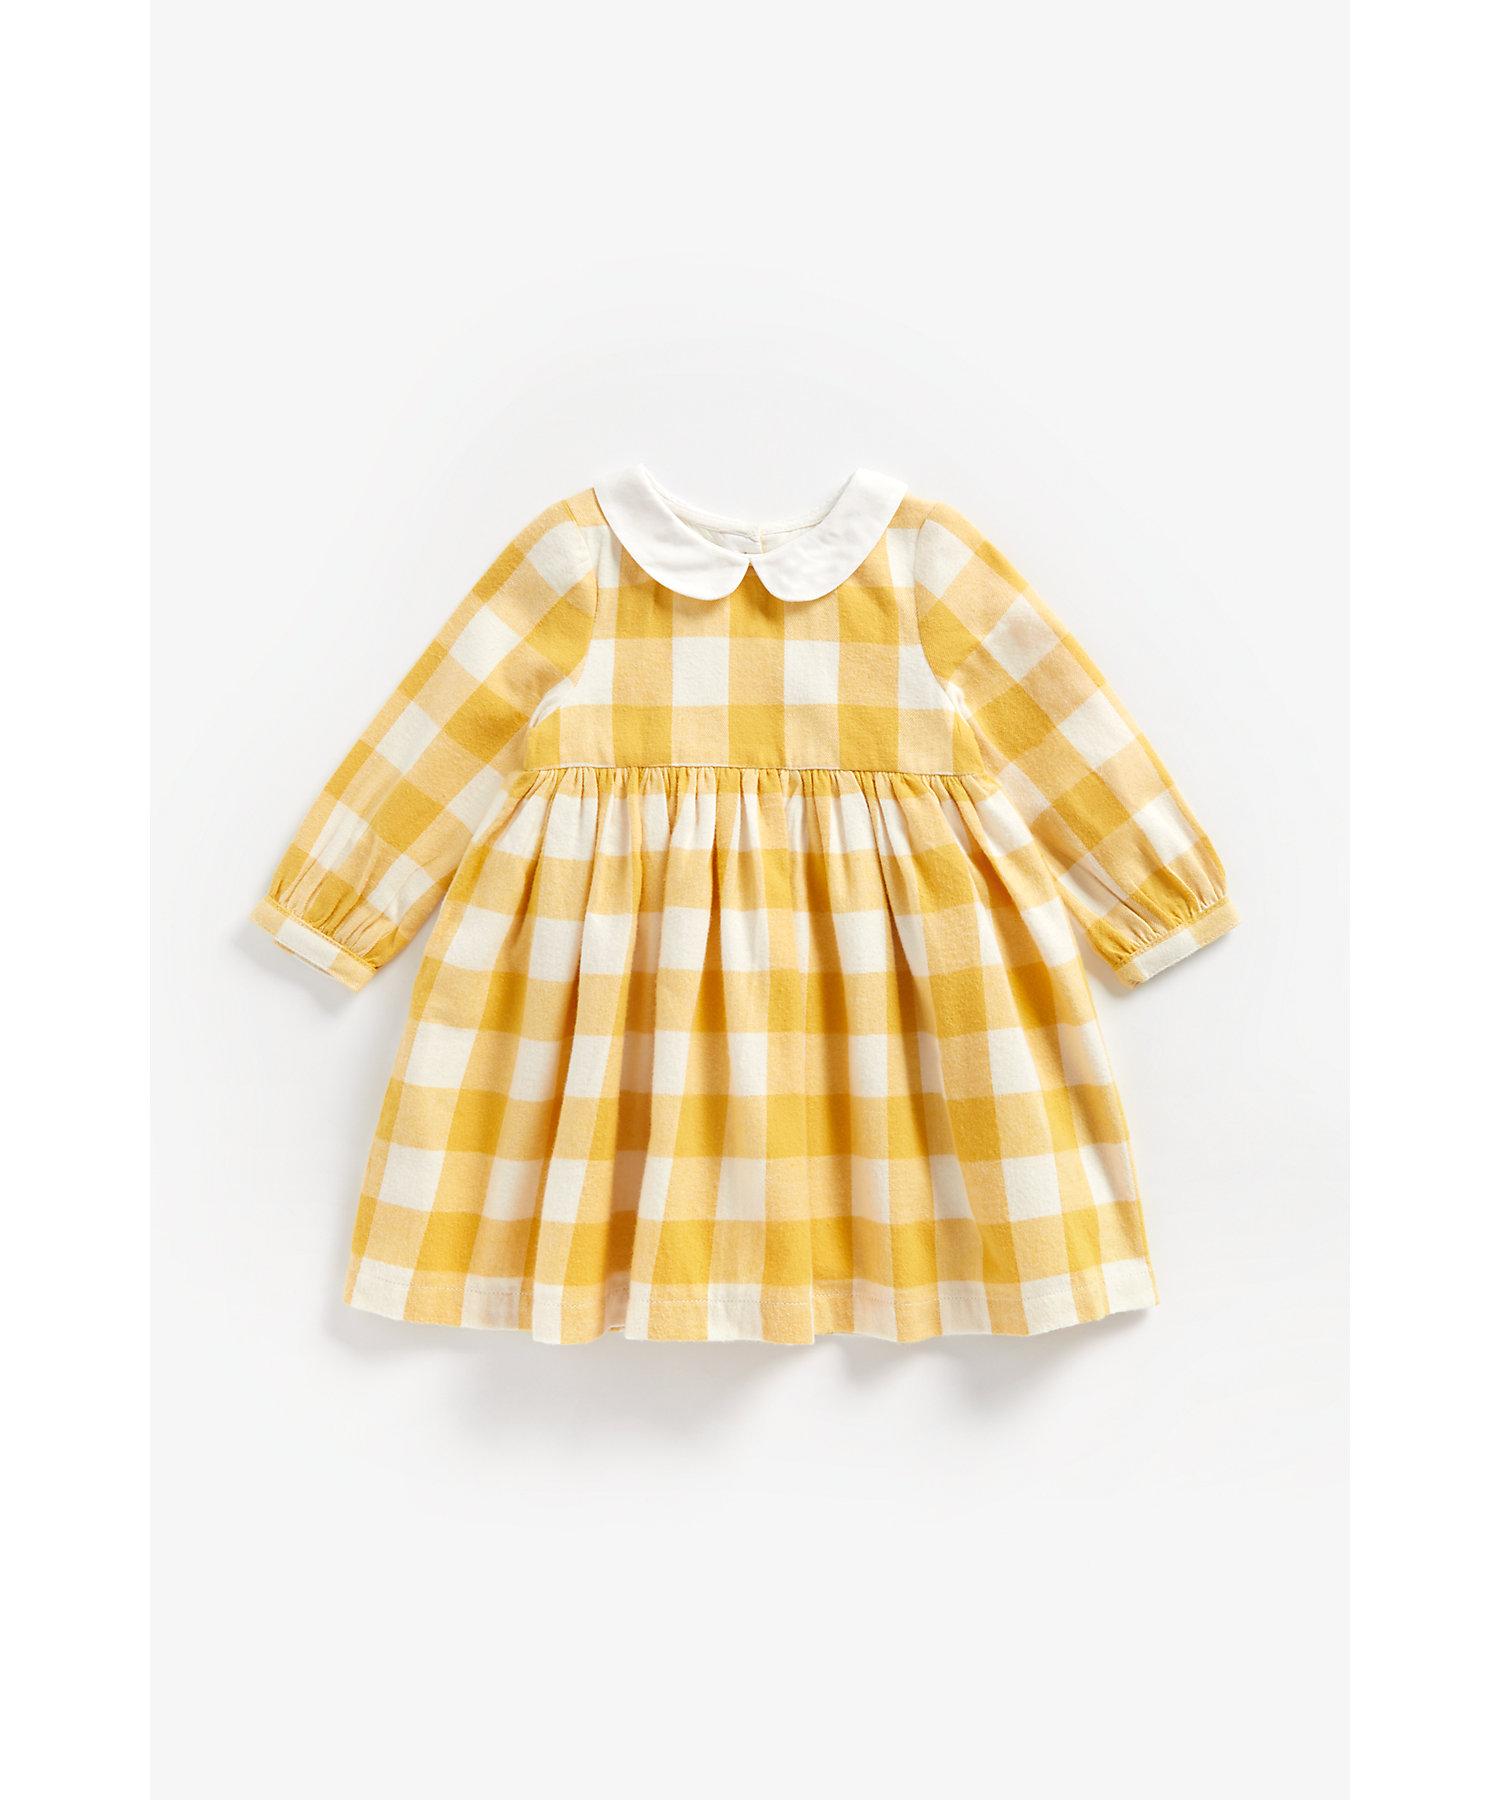 Mothercare | Girls Full Sleeves Collared Dress Checks - Mustard